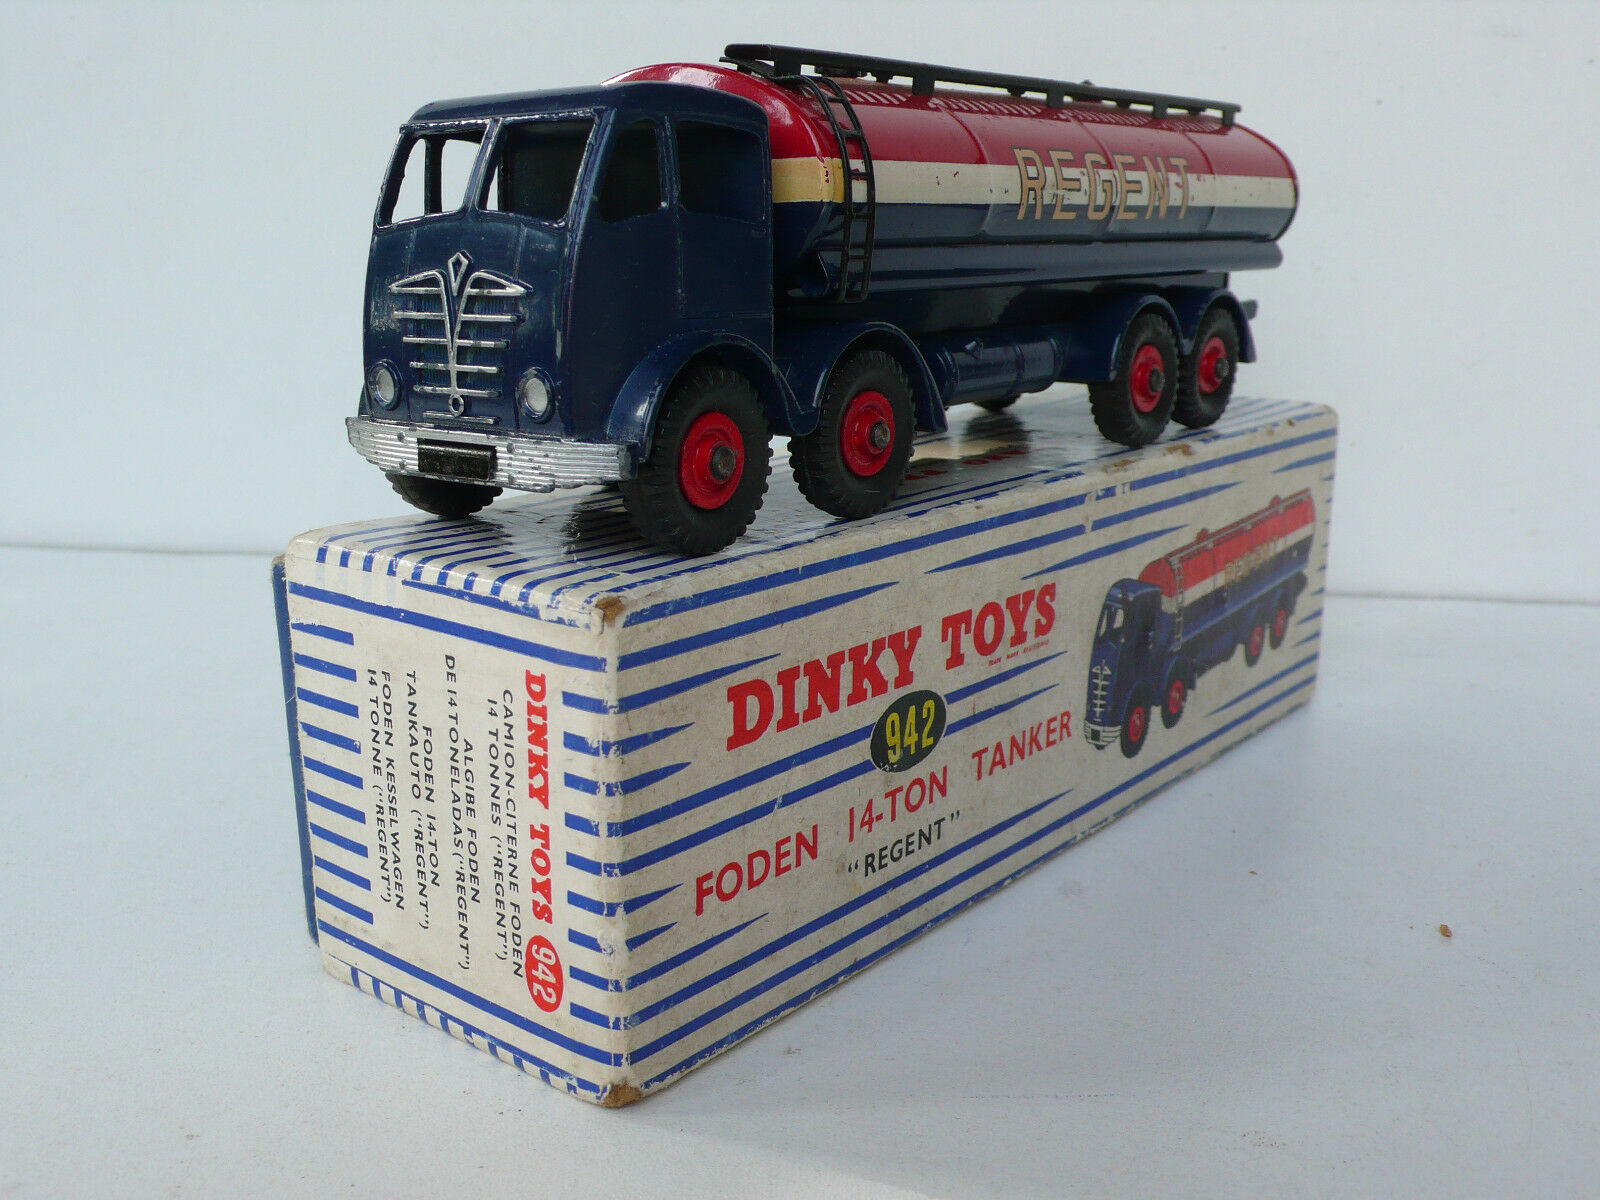 DINKY TOYS GB  FODEN 14-TON TANKER